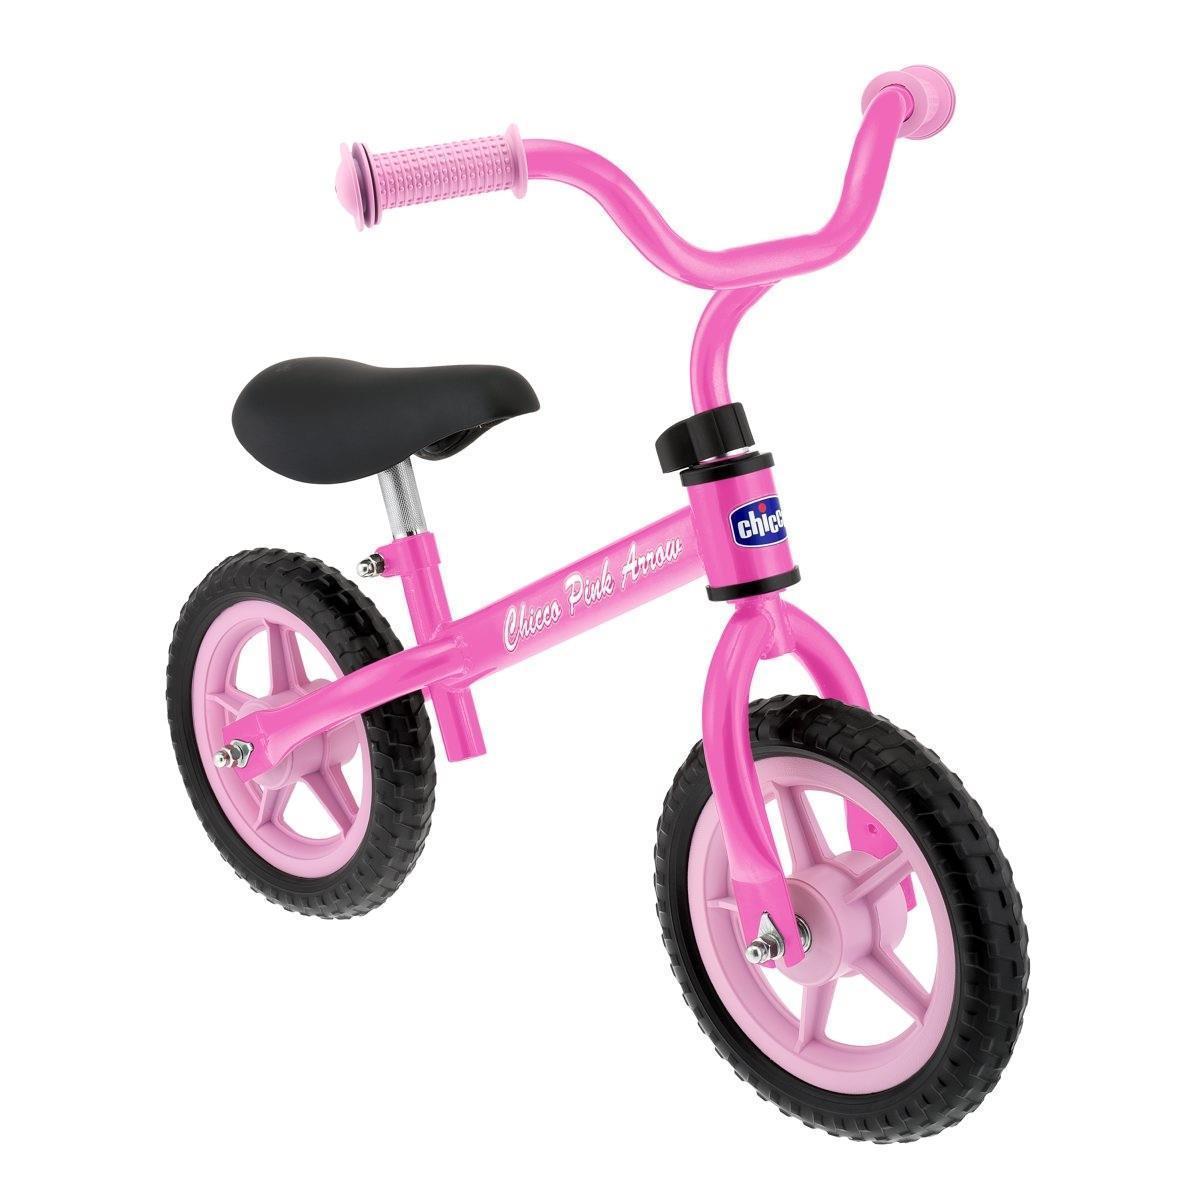 Беговел Чикко Ducati Balance Bike Chicco розовый 017161